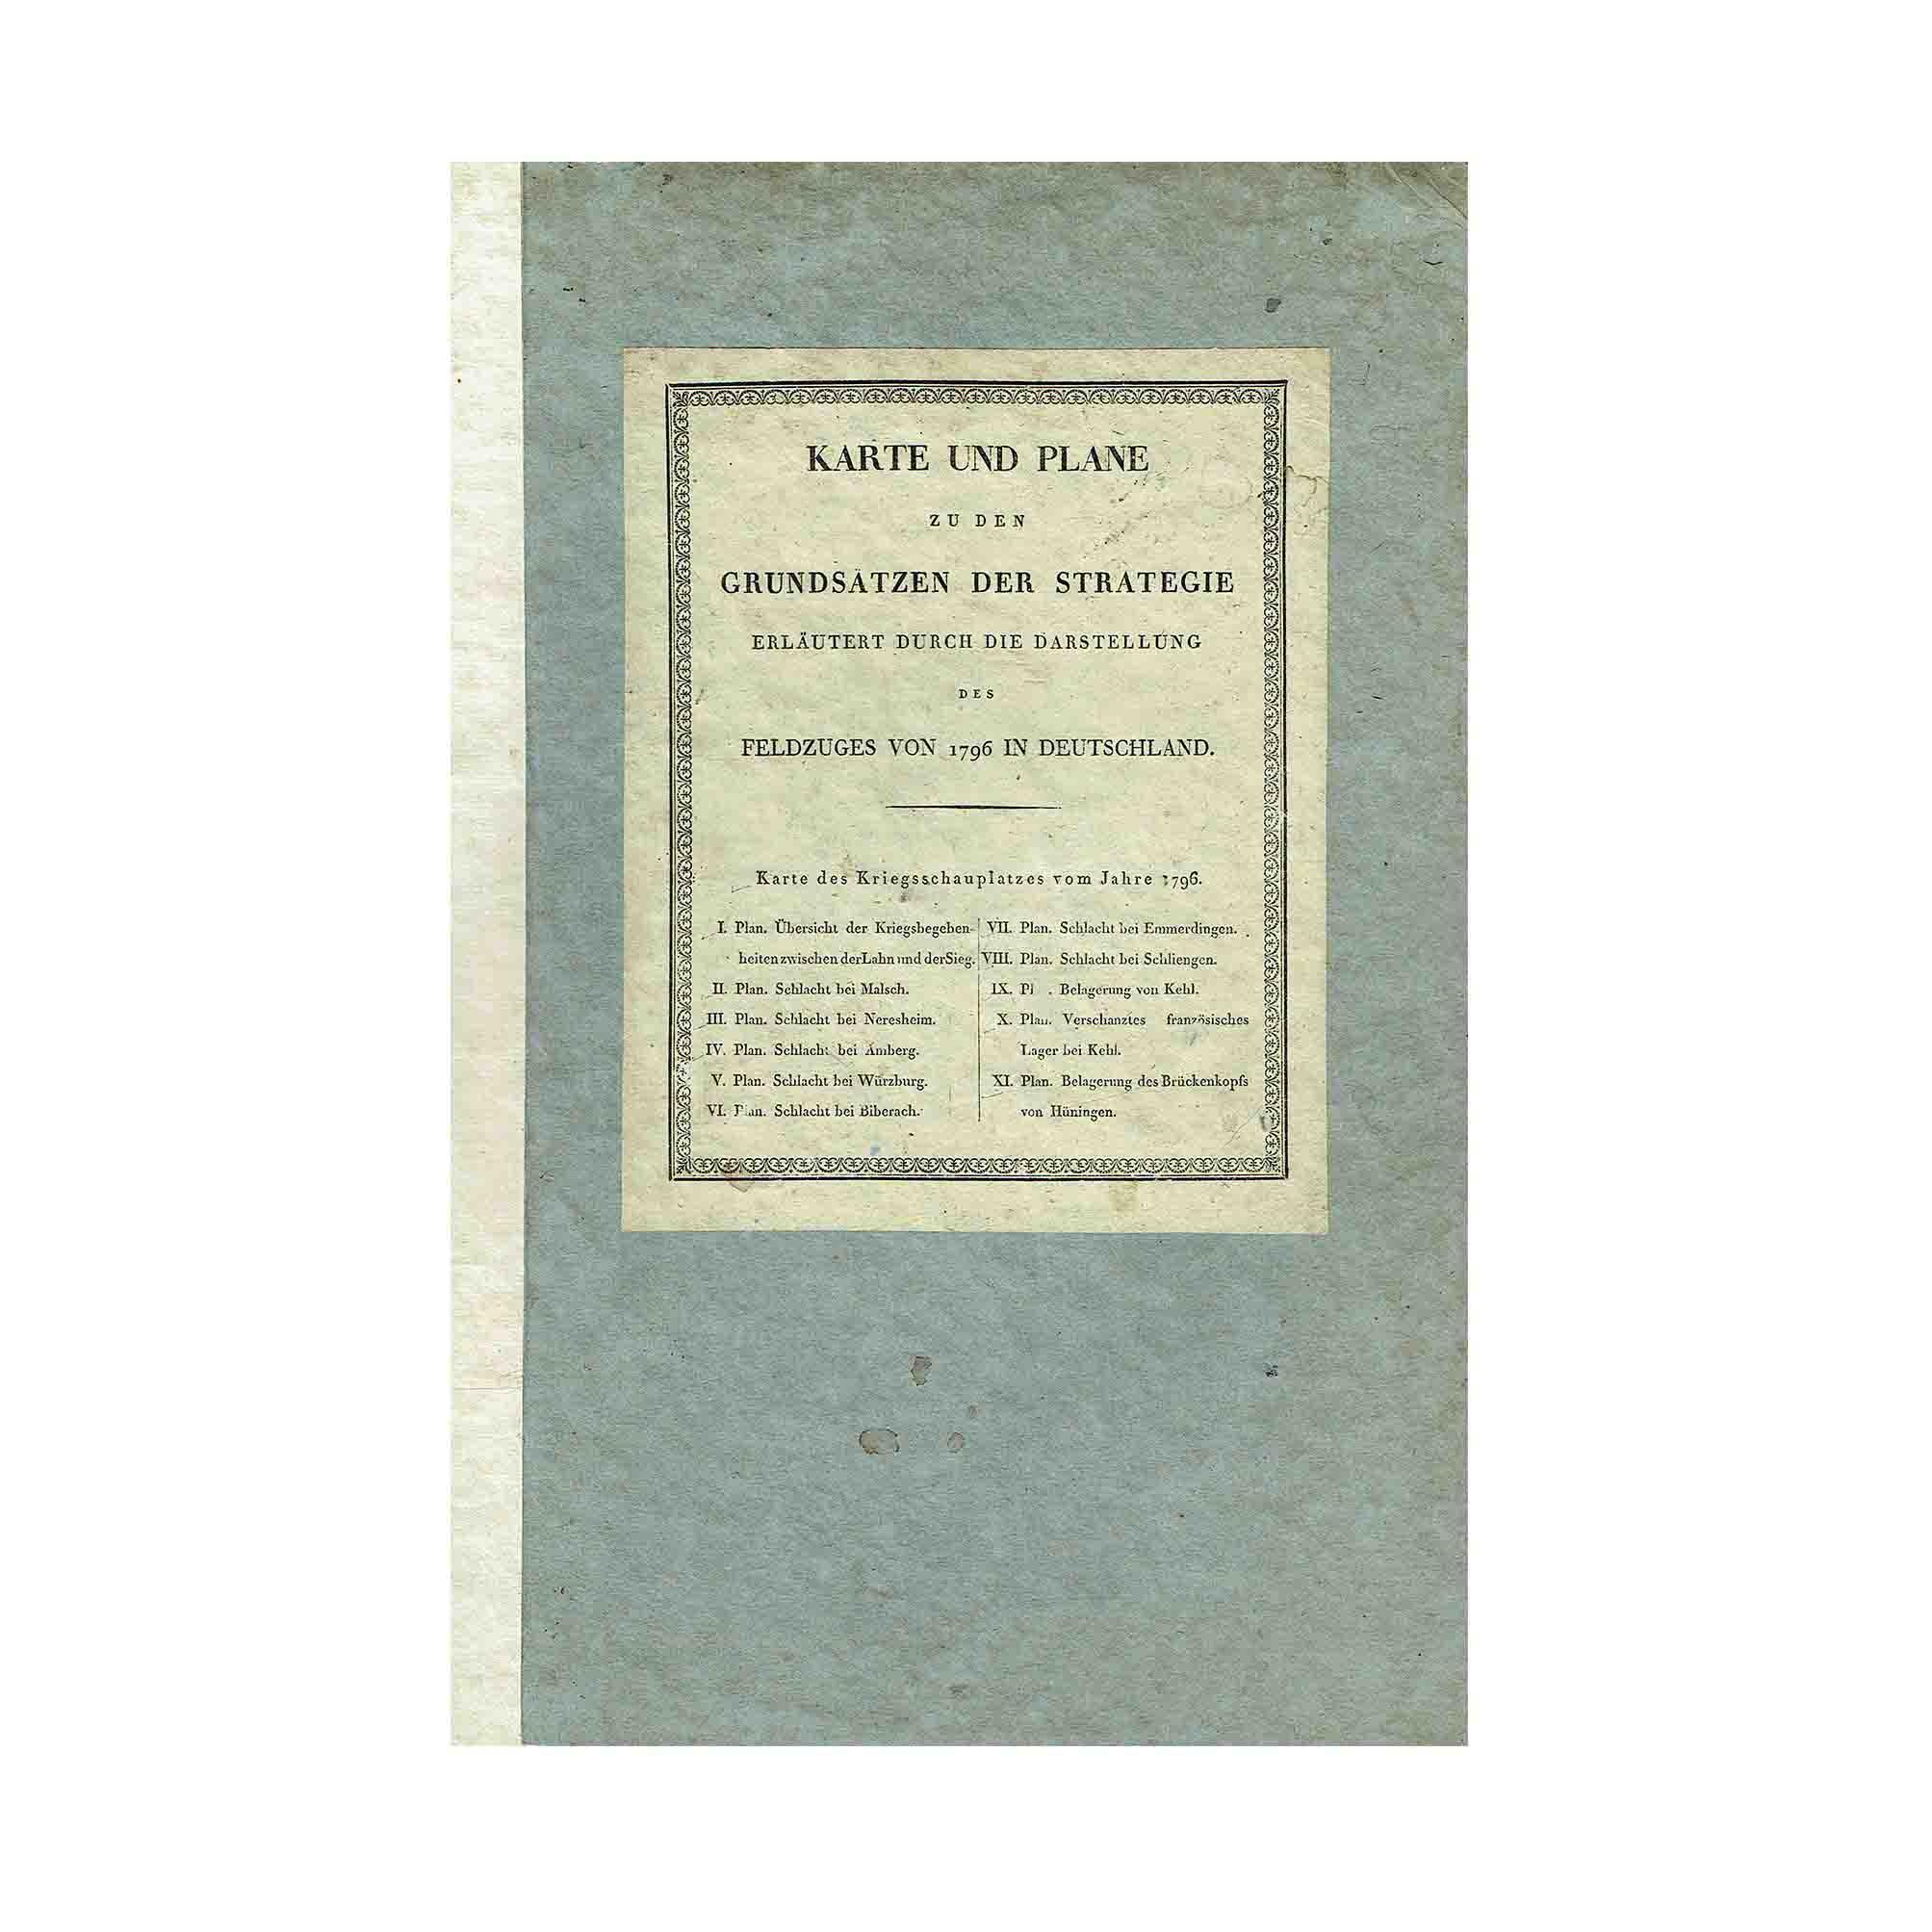 Karl-Karte-Plane-Strategie-Napoleon-1813-Einband-A-N.jpg